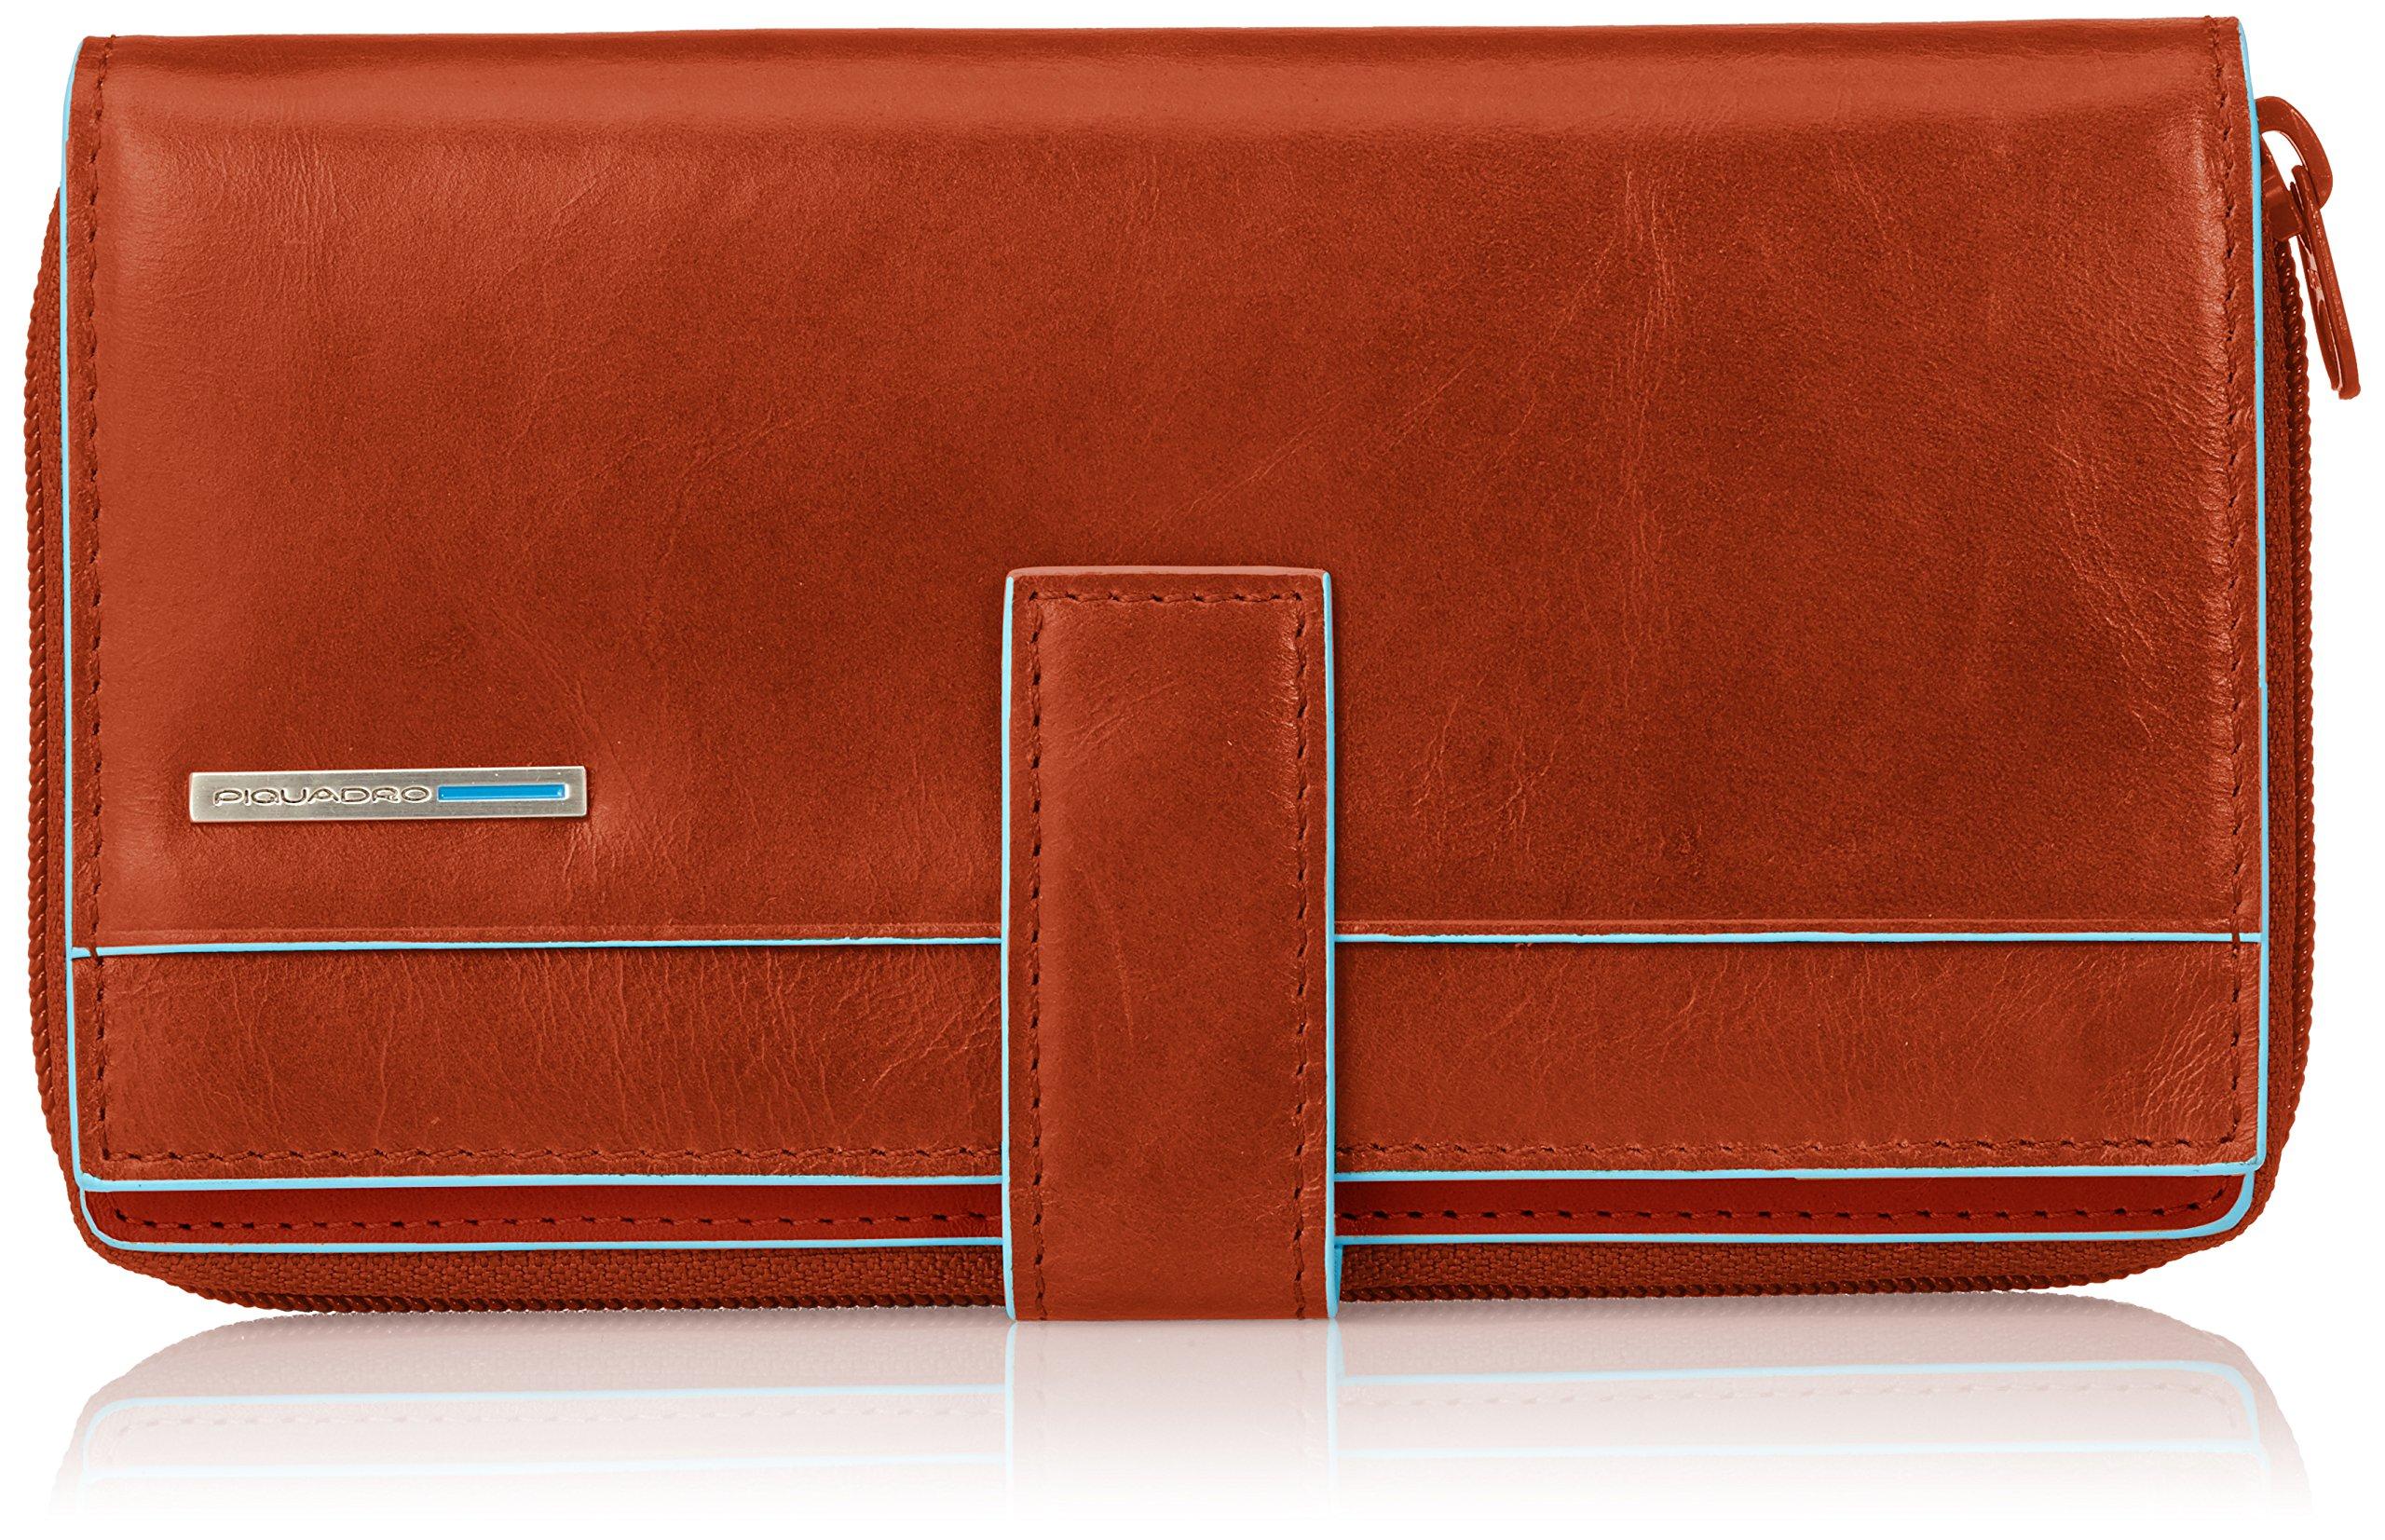 Piquadro Lady's Wallet In Leather, Orange/Orange, One Size